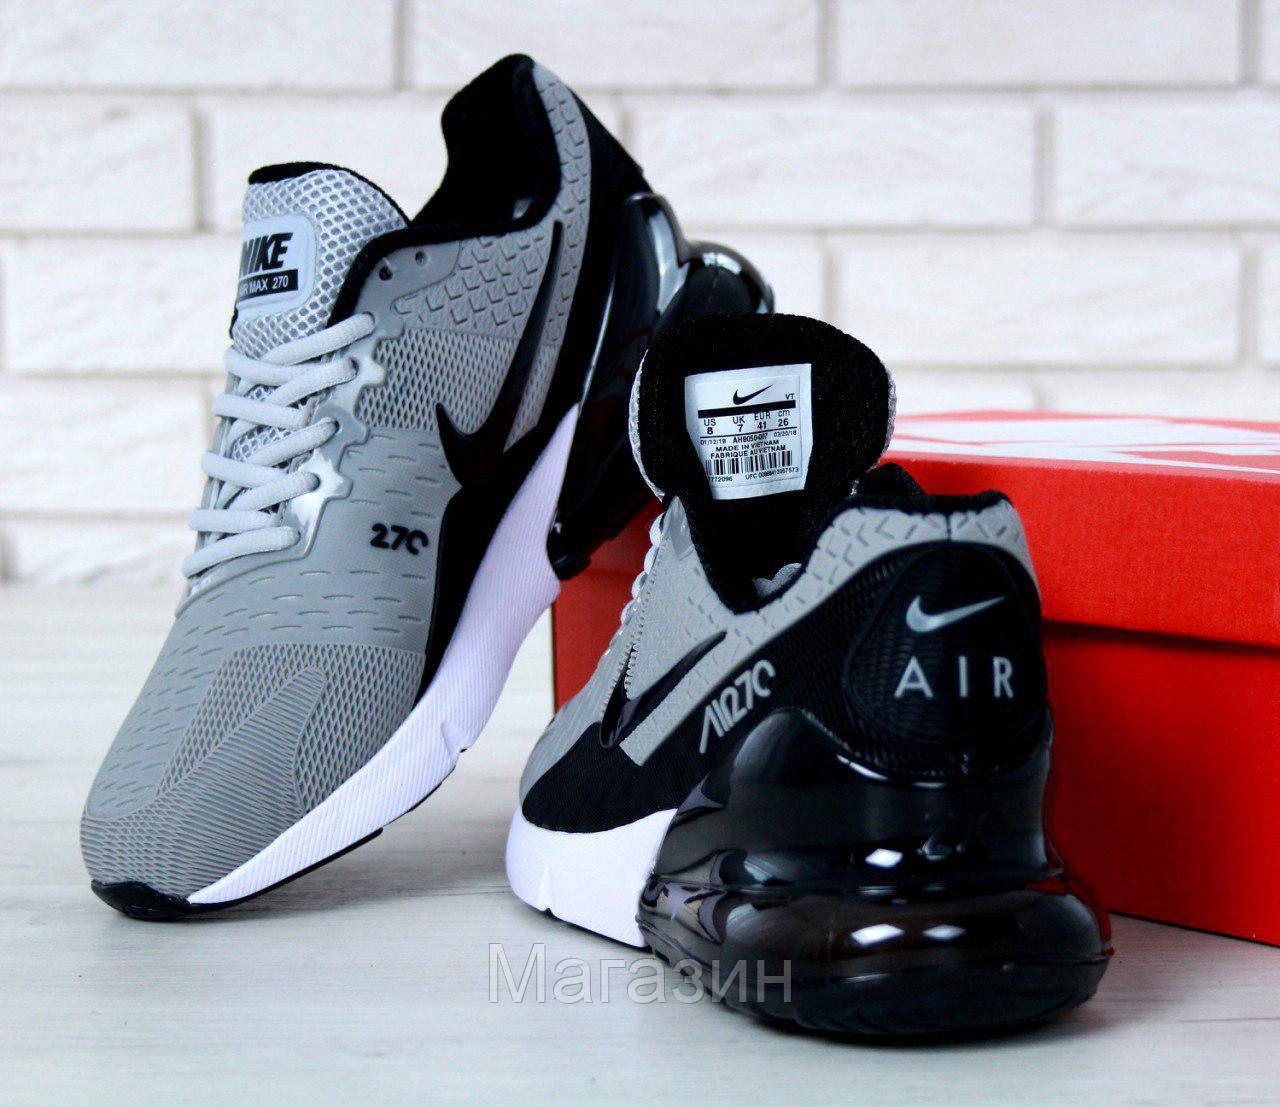 84cf9be2 Мужские кроссовки Nike Air Max Flair 270 KPU Grey (Найк Аир Макс 270)  серые, цена 1 448 грн., купить в Киеве — Prom.ua (ID#792879766)